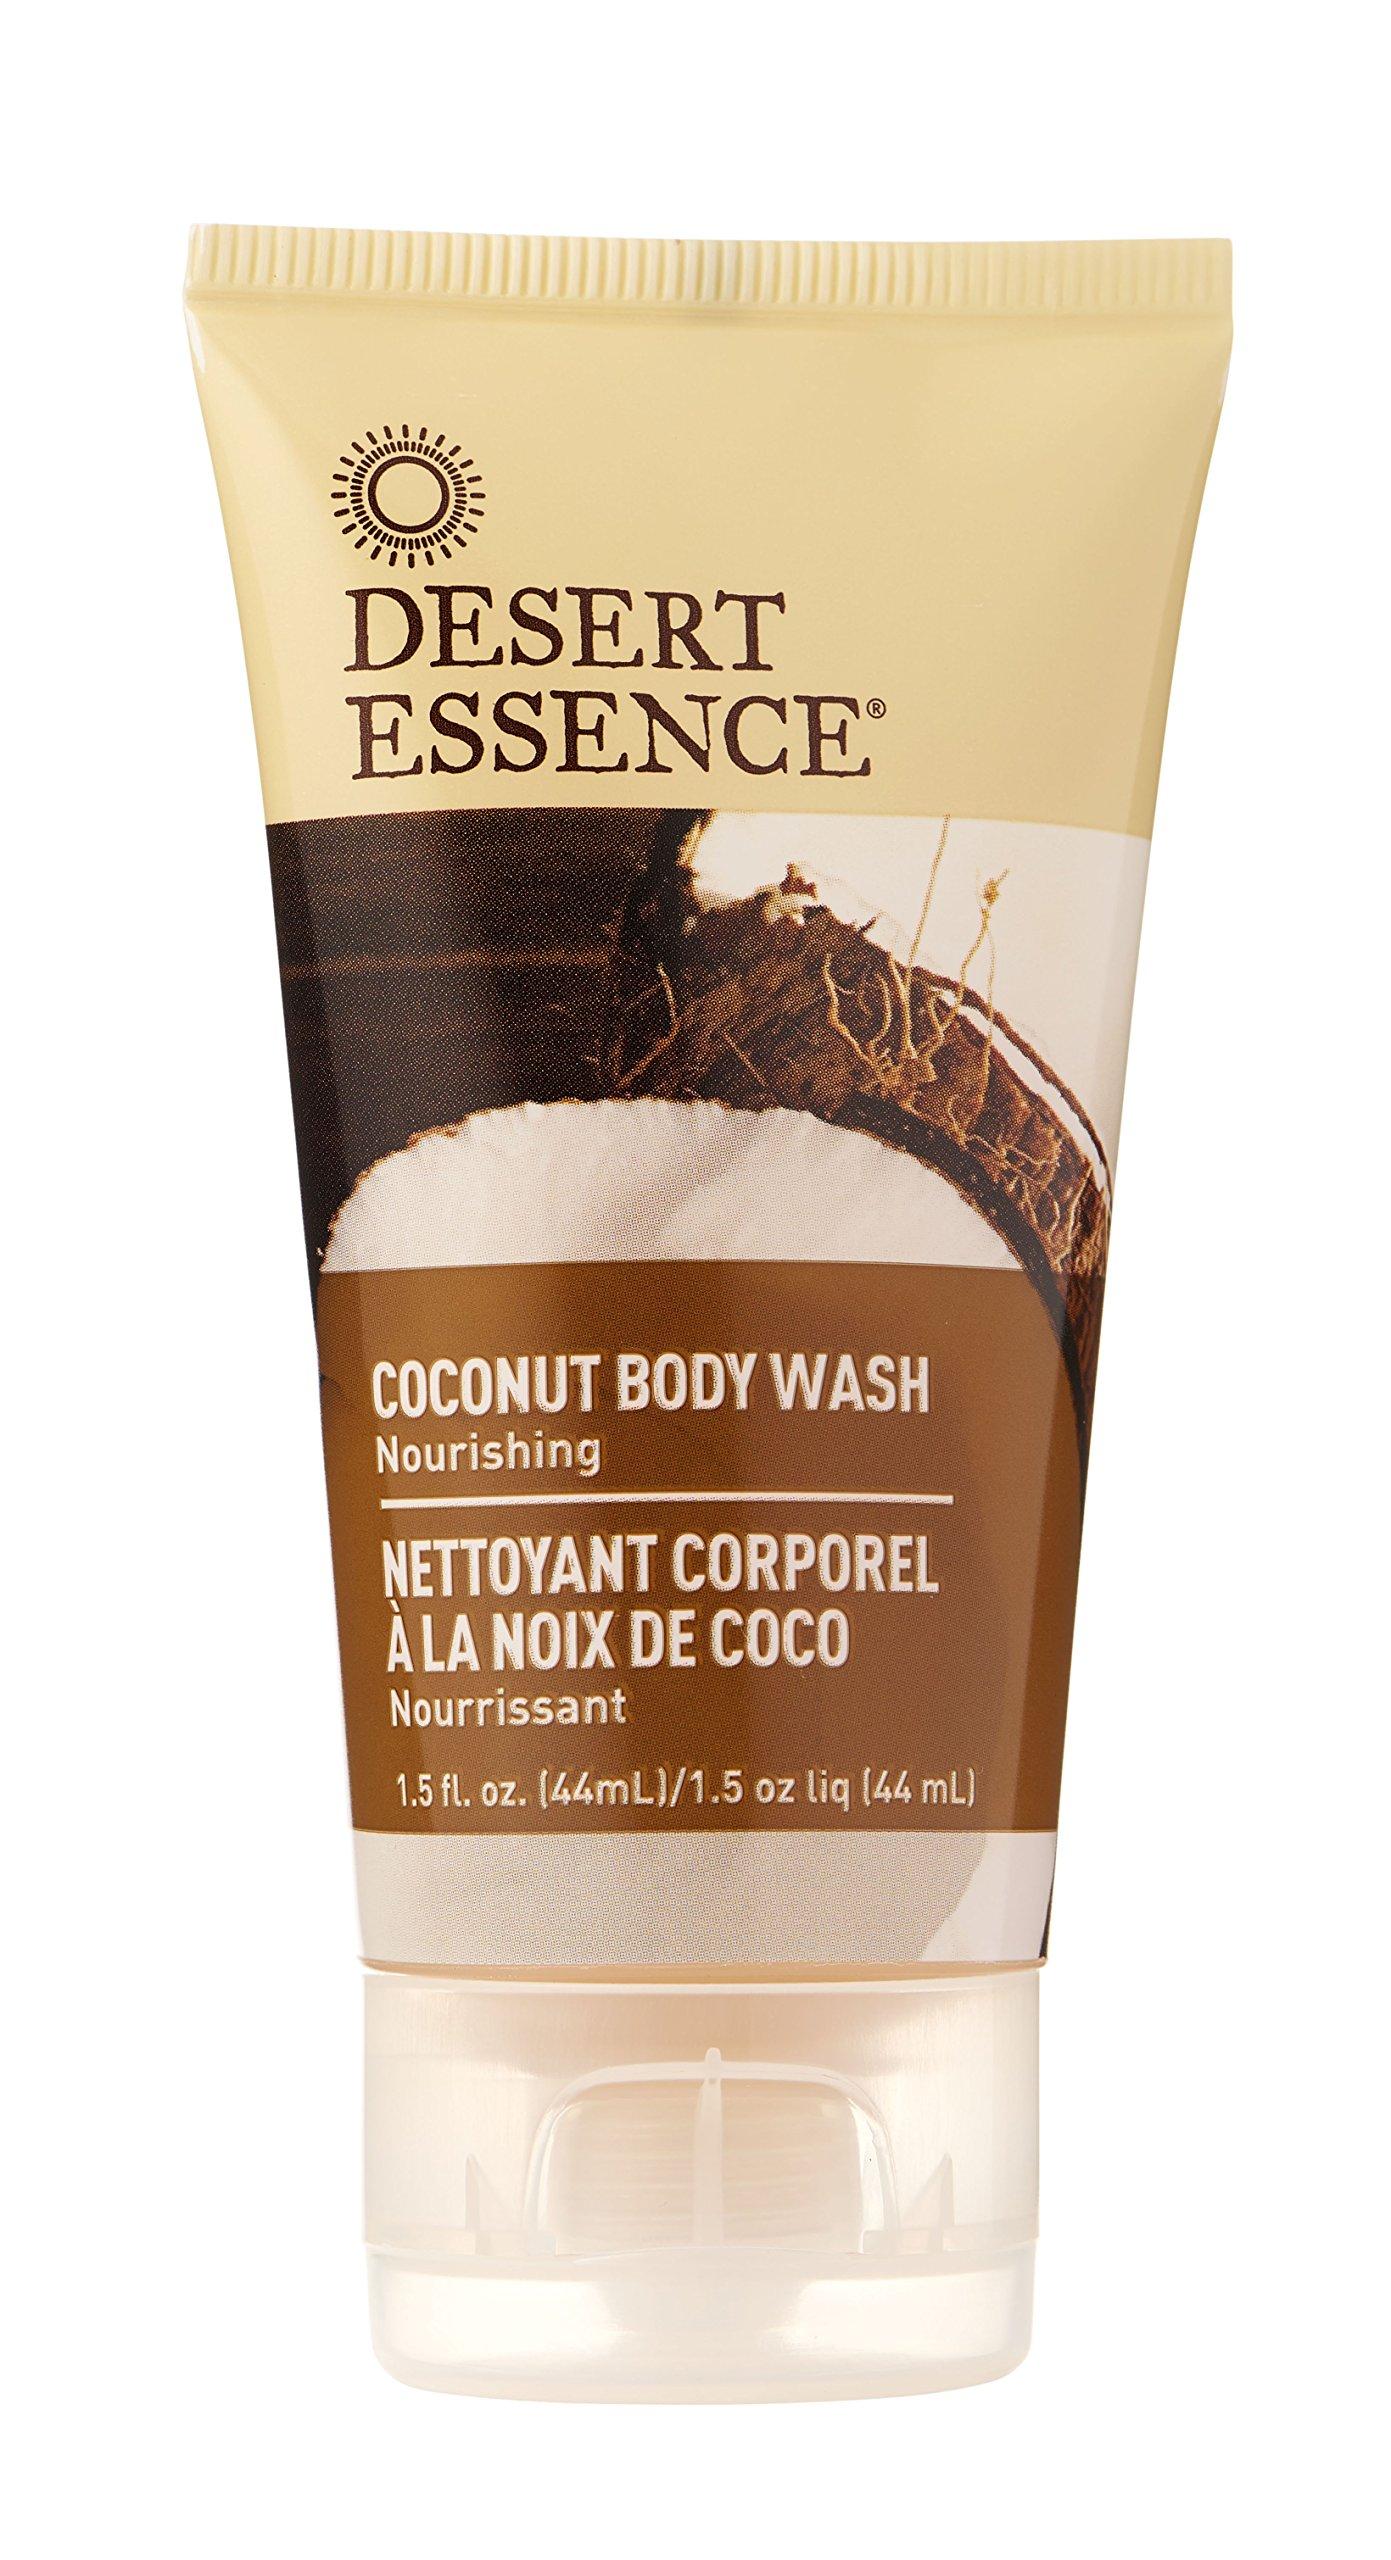 Desert Essence Coconut Body Wash - 1.5 Fl Oz - Nourishing - Jojoba Oil - Sugar Maple - Shea Butter - Revitalizes Skin - Intense Hydration - Vegan - Gluten Free - Cruelty Free - Paraben Free